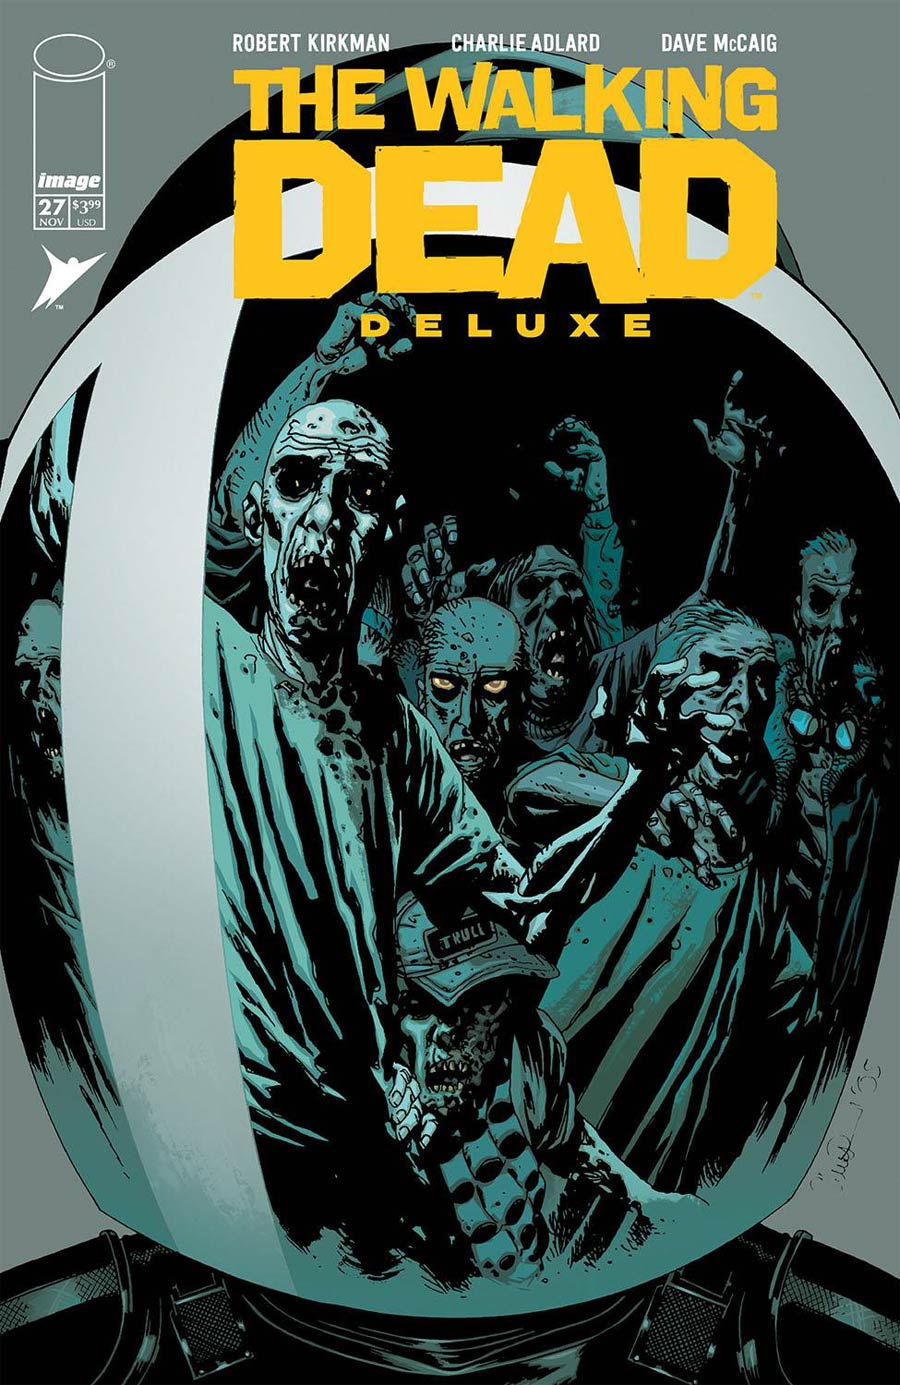 Walking Dead Deluxe #27 Cover B Variant Charlie Adlard & McCaig Cover